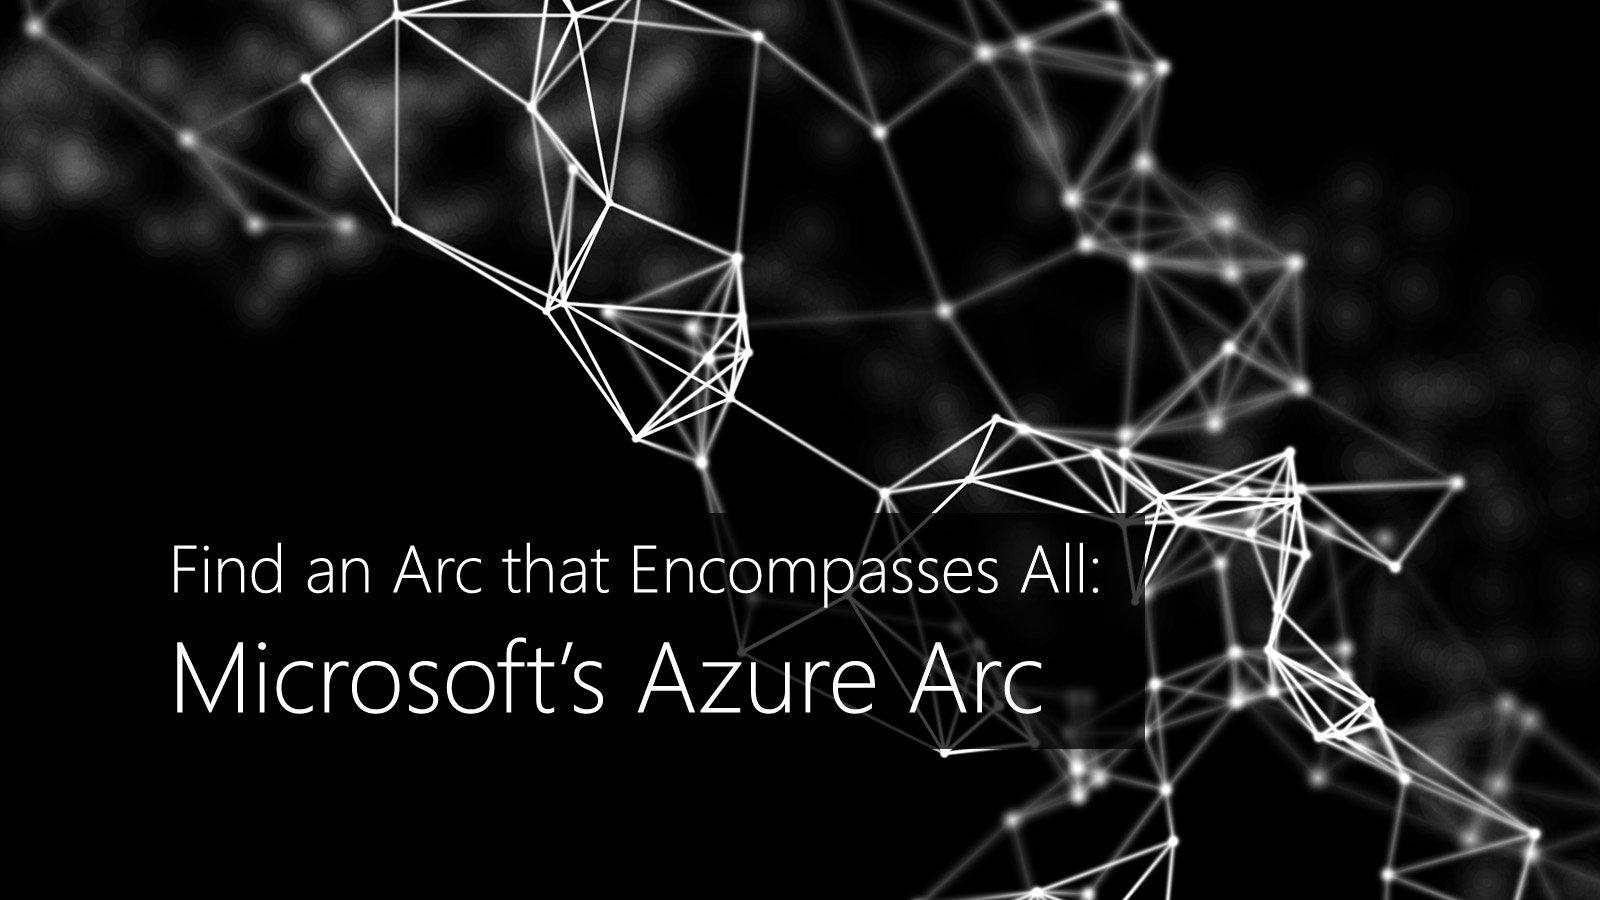 TMC-blog-find-an-arc-that-encompasses-all-microsofts-azure-arc